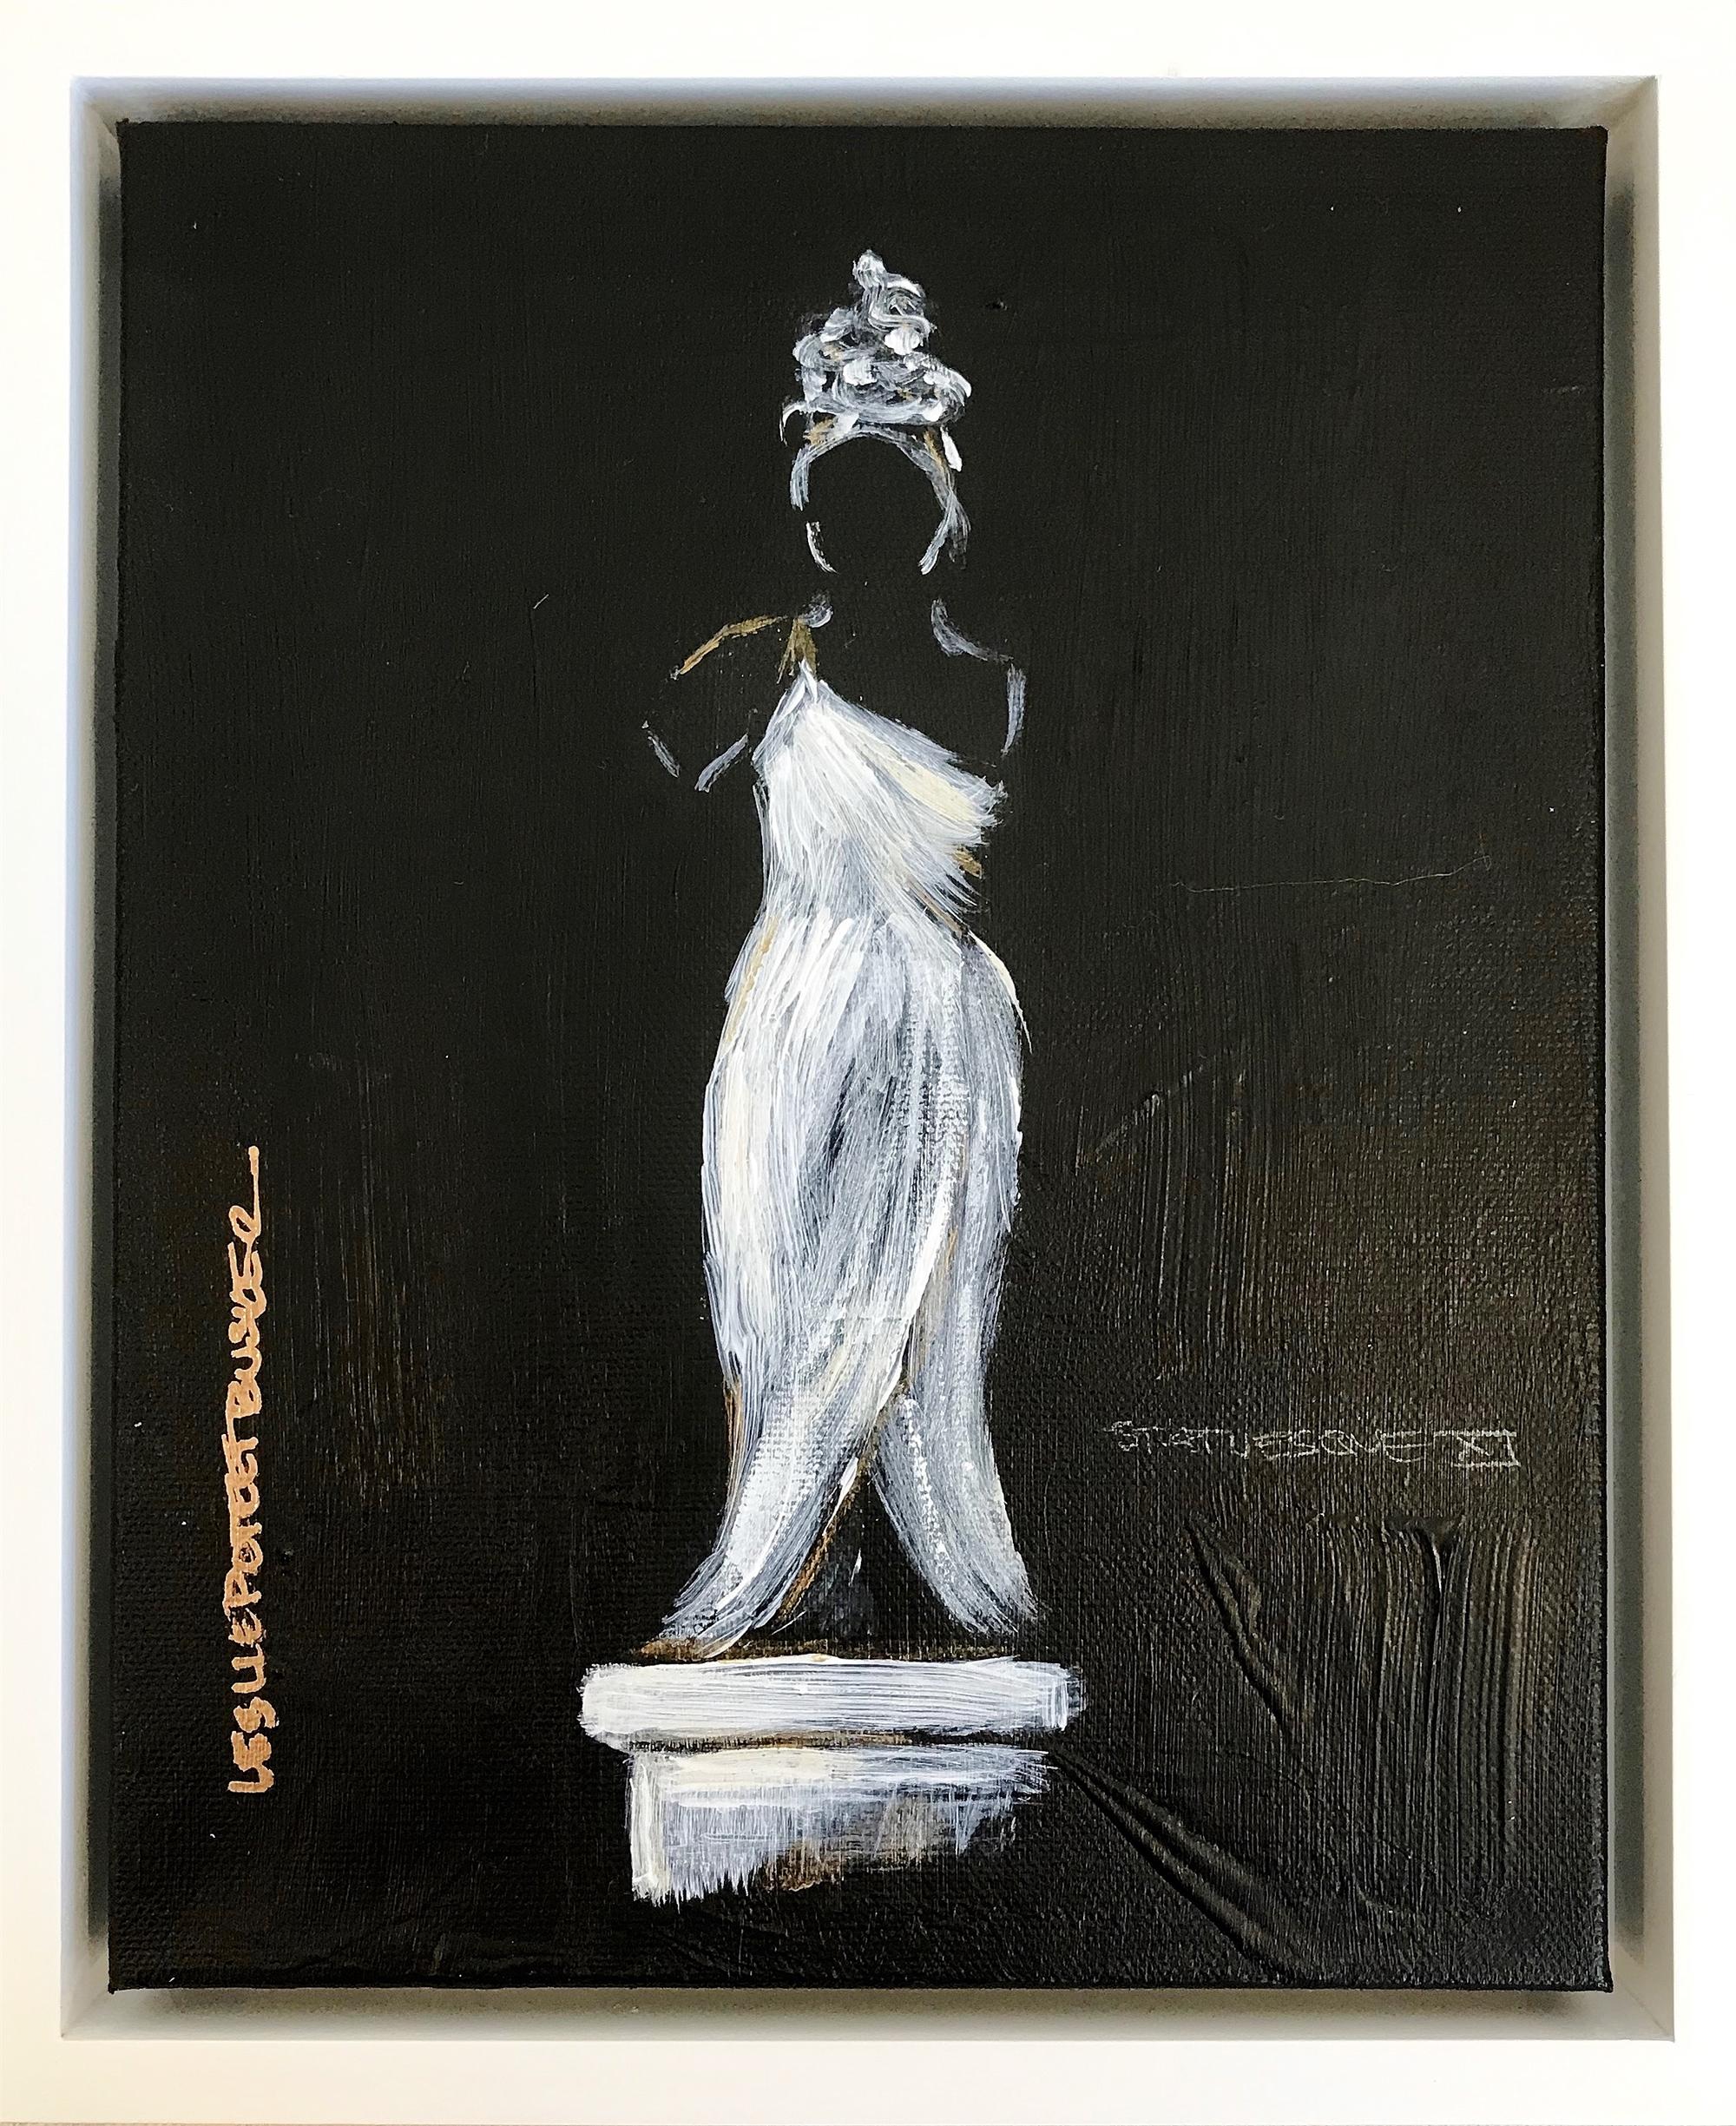 Statuesque XI by Leslie Poteet Busker